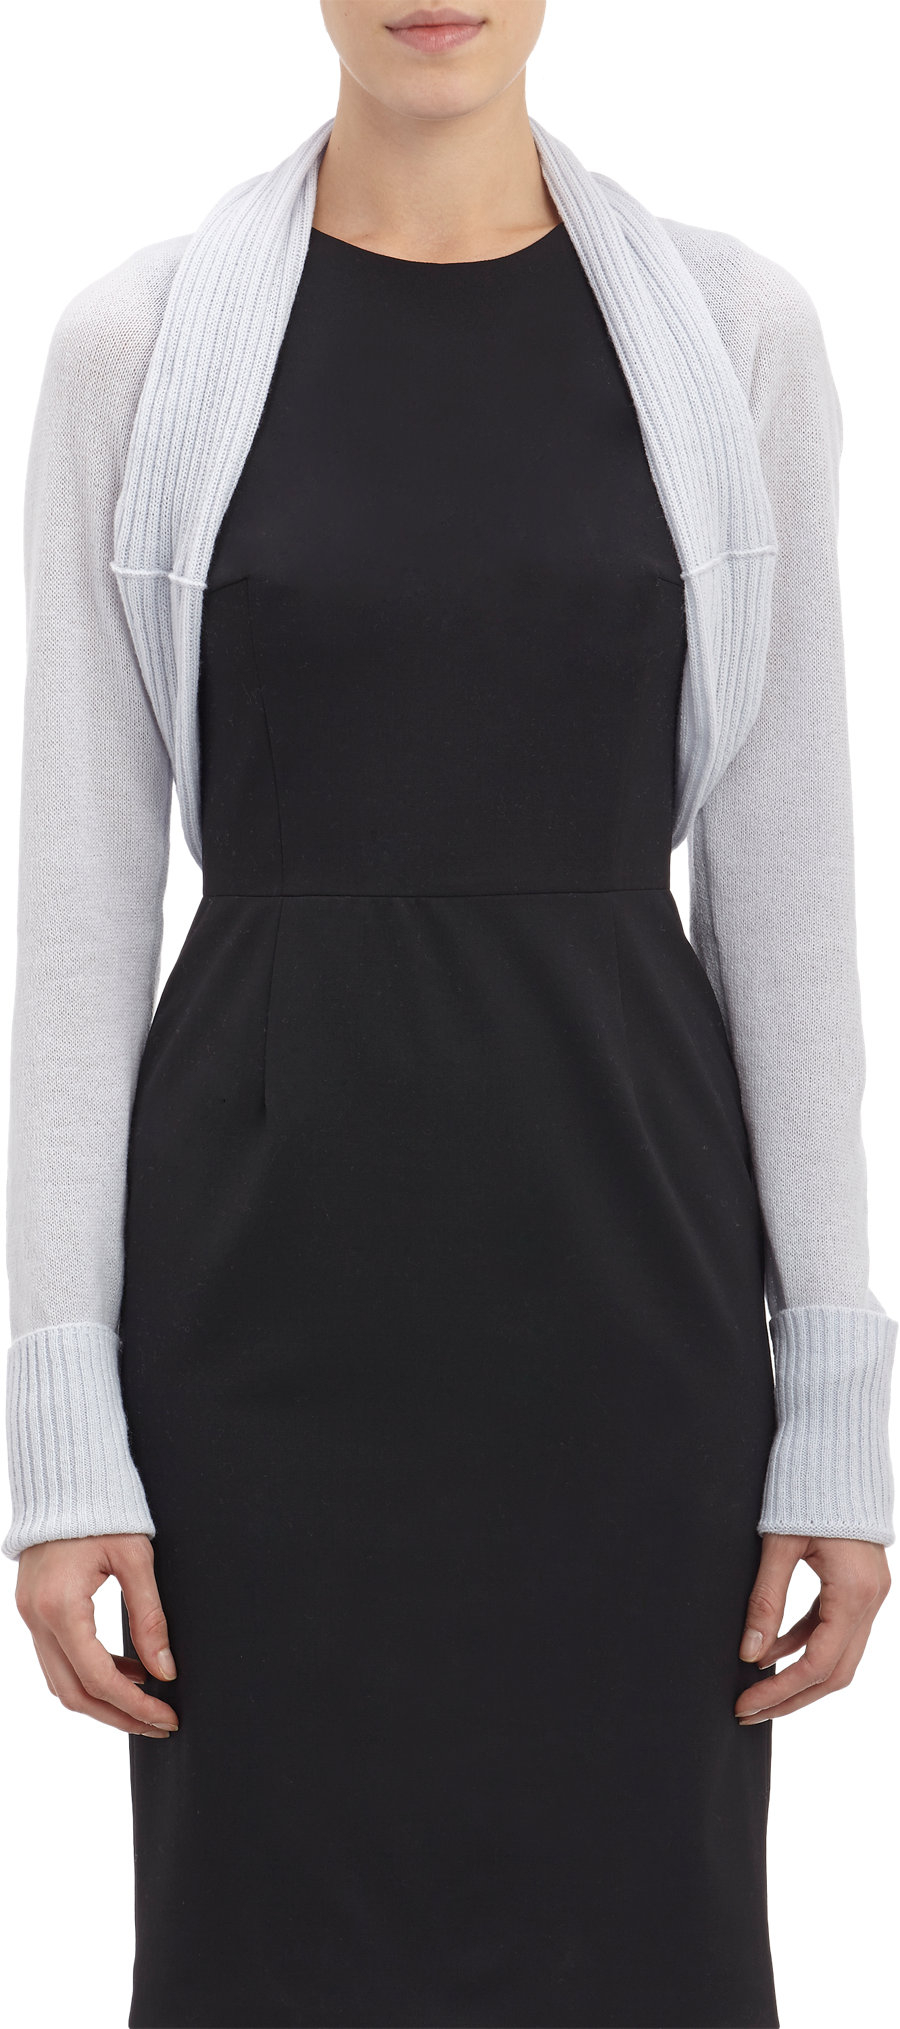 Long Sleeved Shrug Knitting Pattern : Barneys new york Chunky Rib-Knit Long-Sleeve Shrug in Gray (grey) Lyst